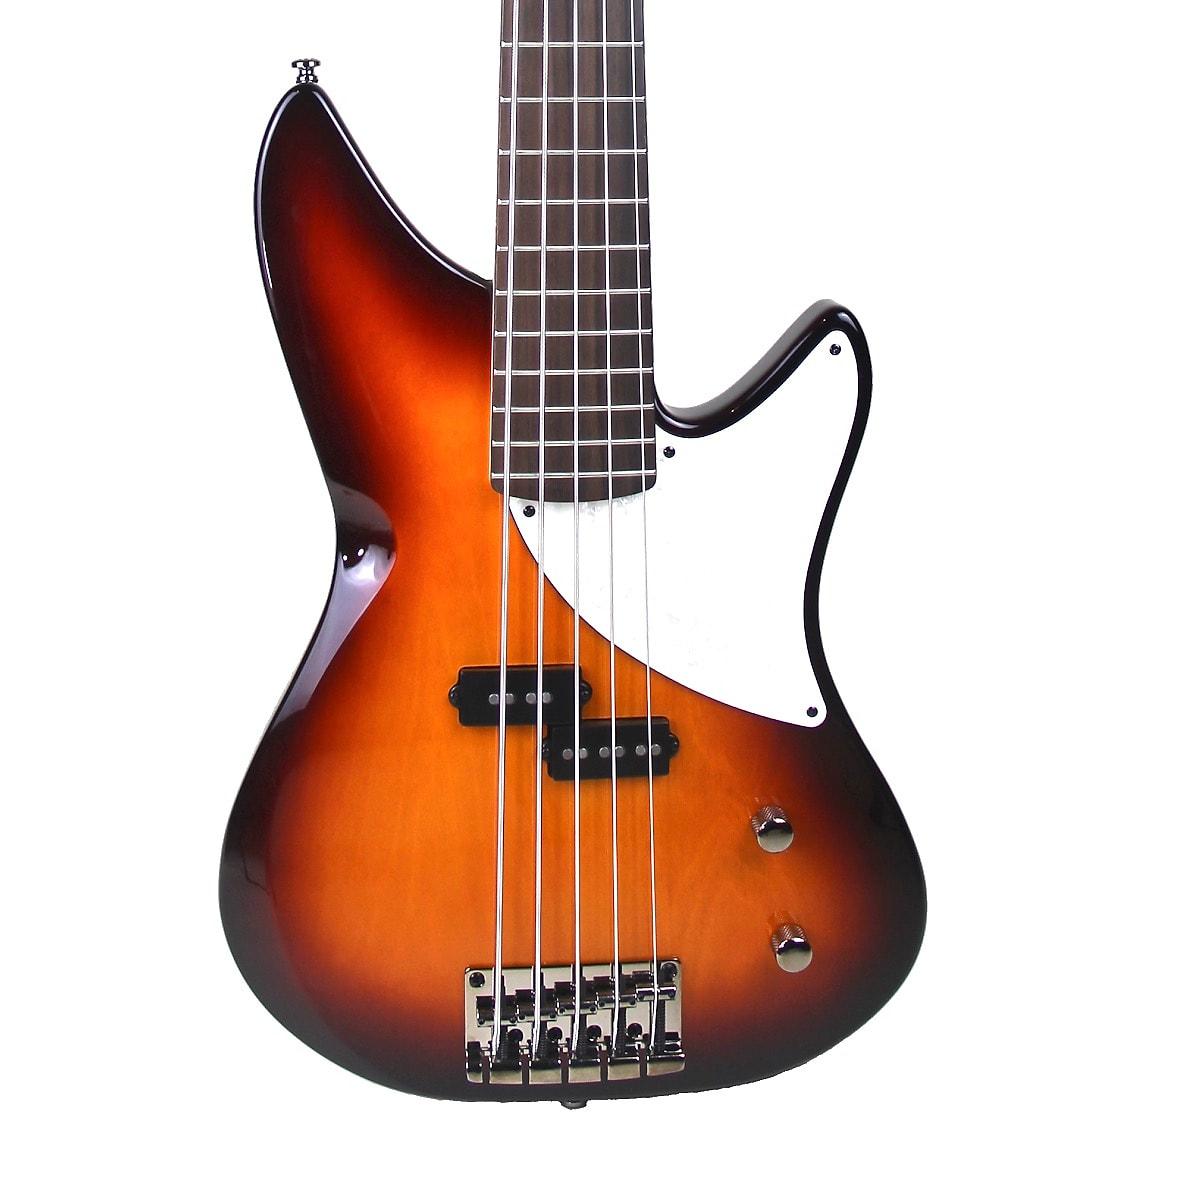 MTD Kingston CRB 5-String Classic Rock Bass Guitar Tobacco Sunburst